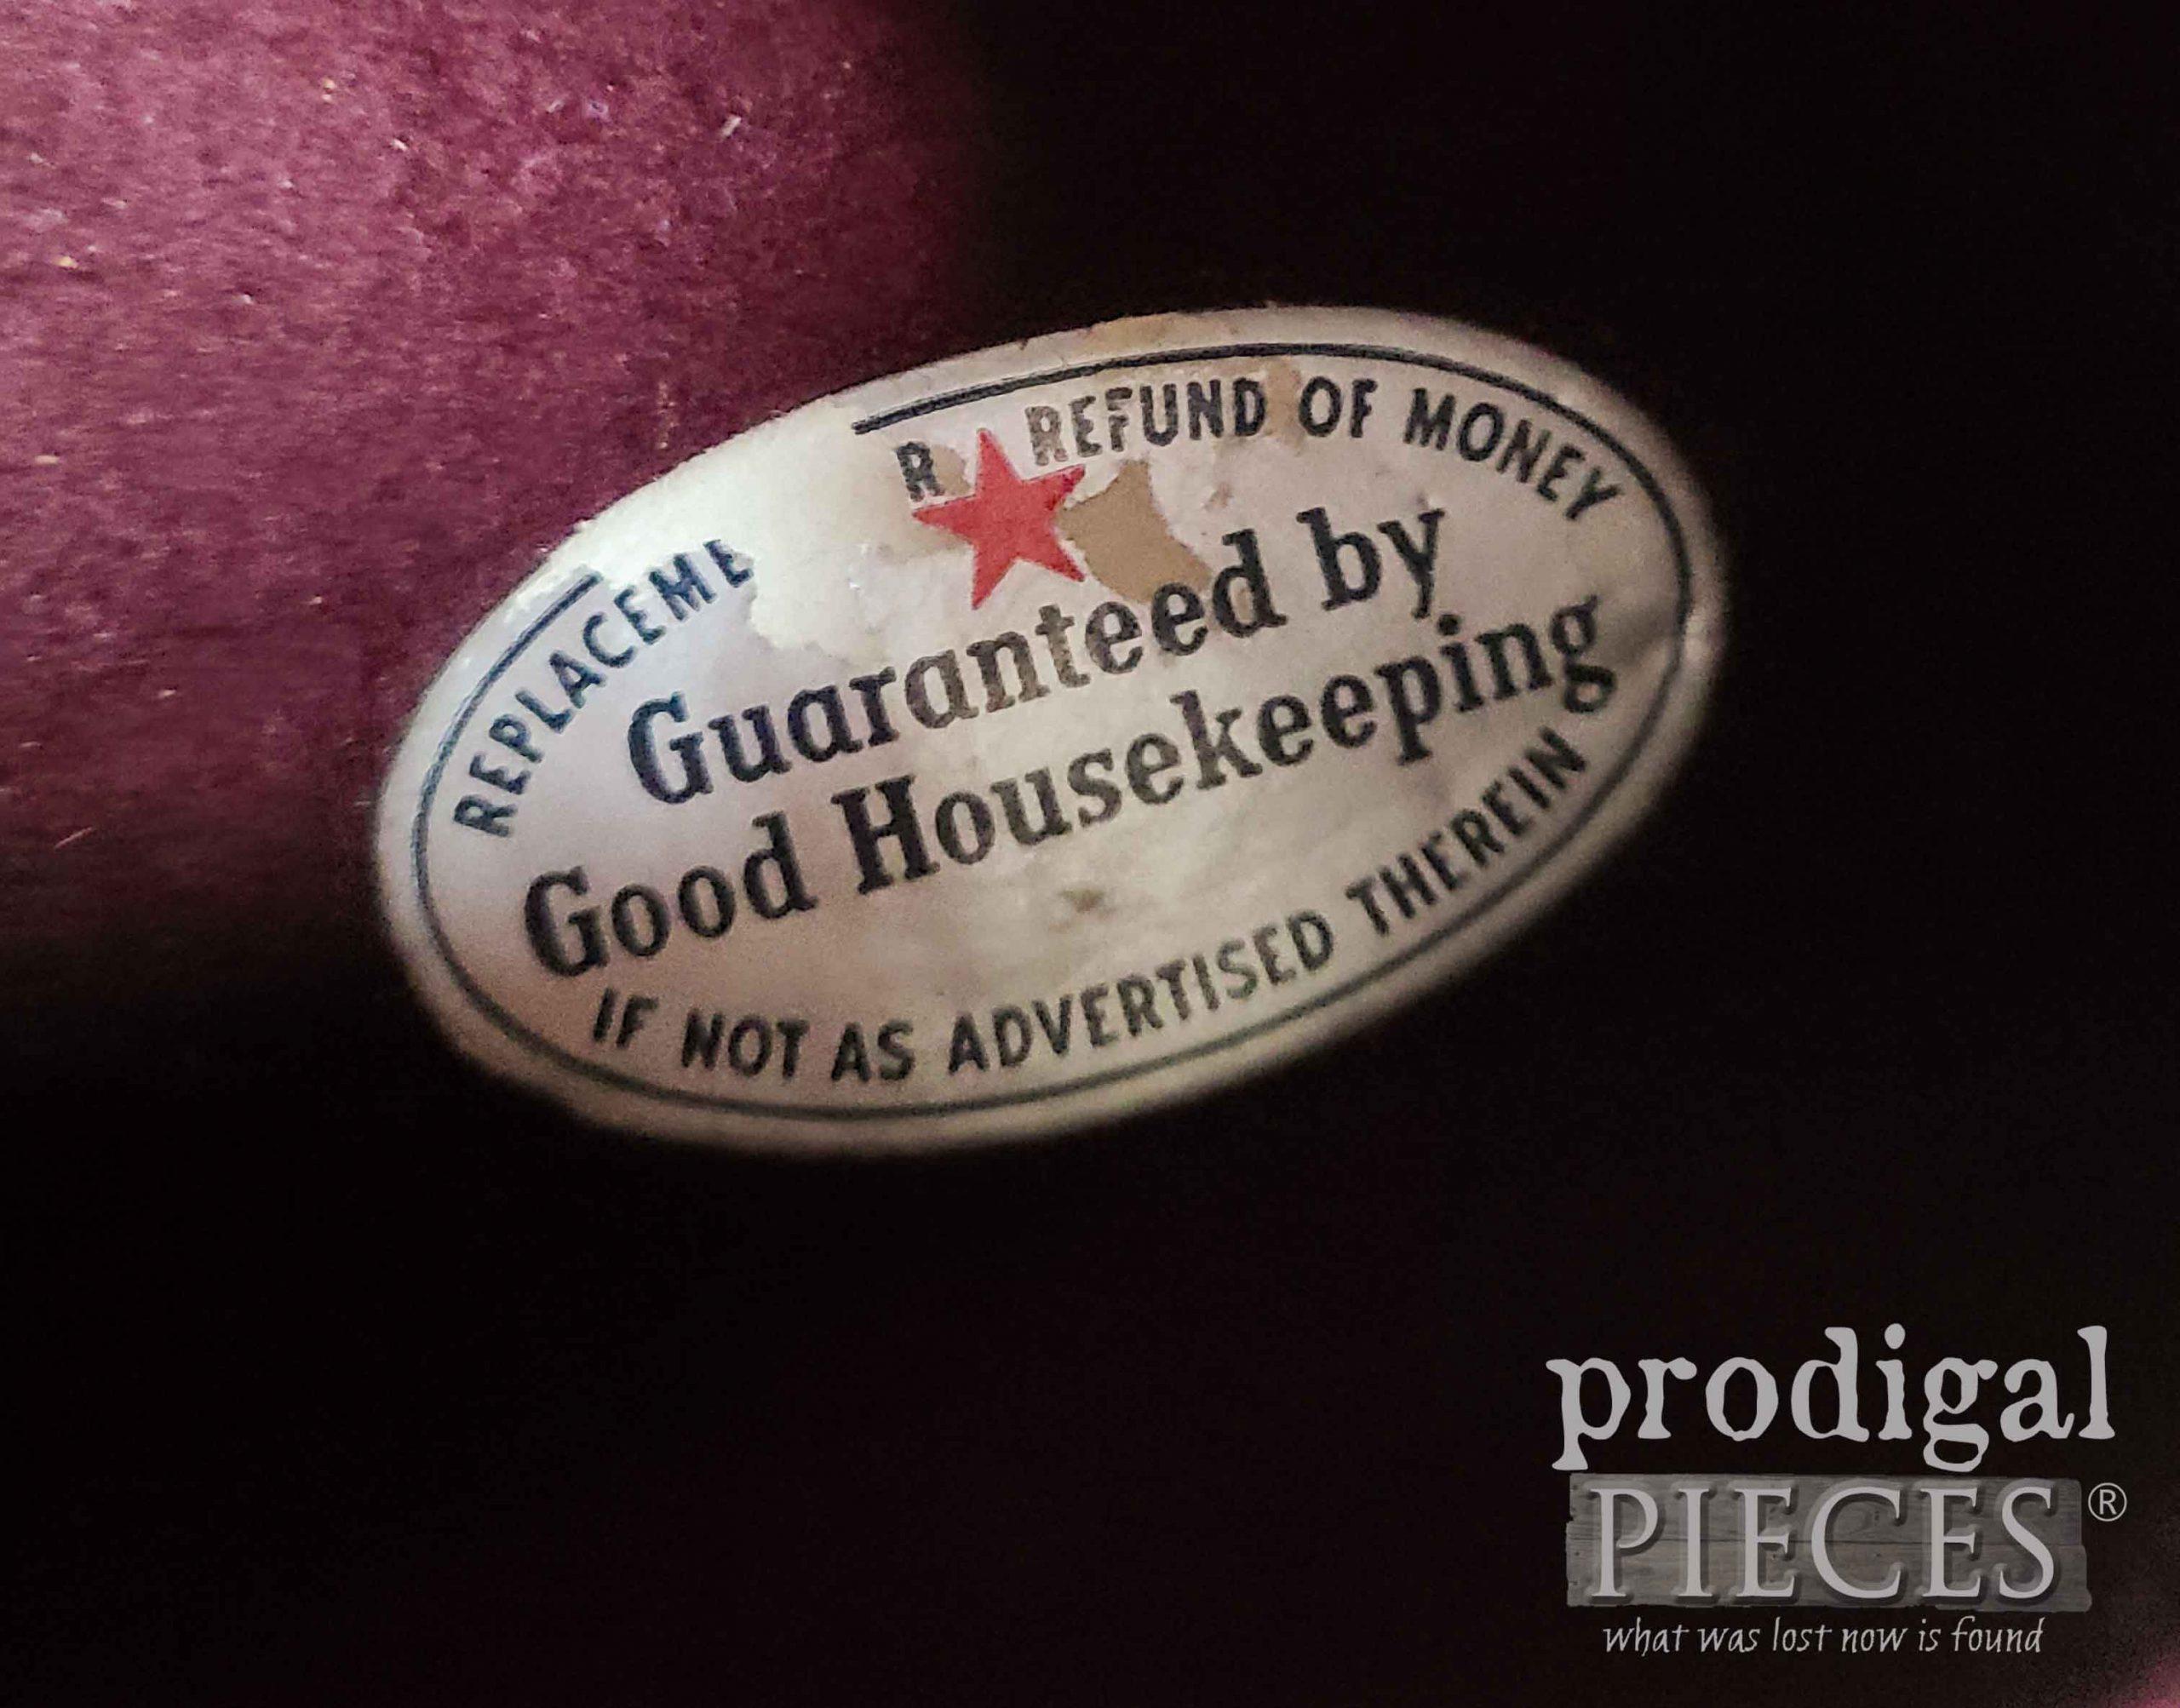 Good Housekeeping Silverware Label   prodigapieces.com